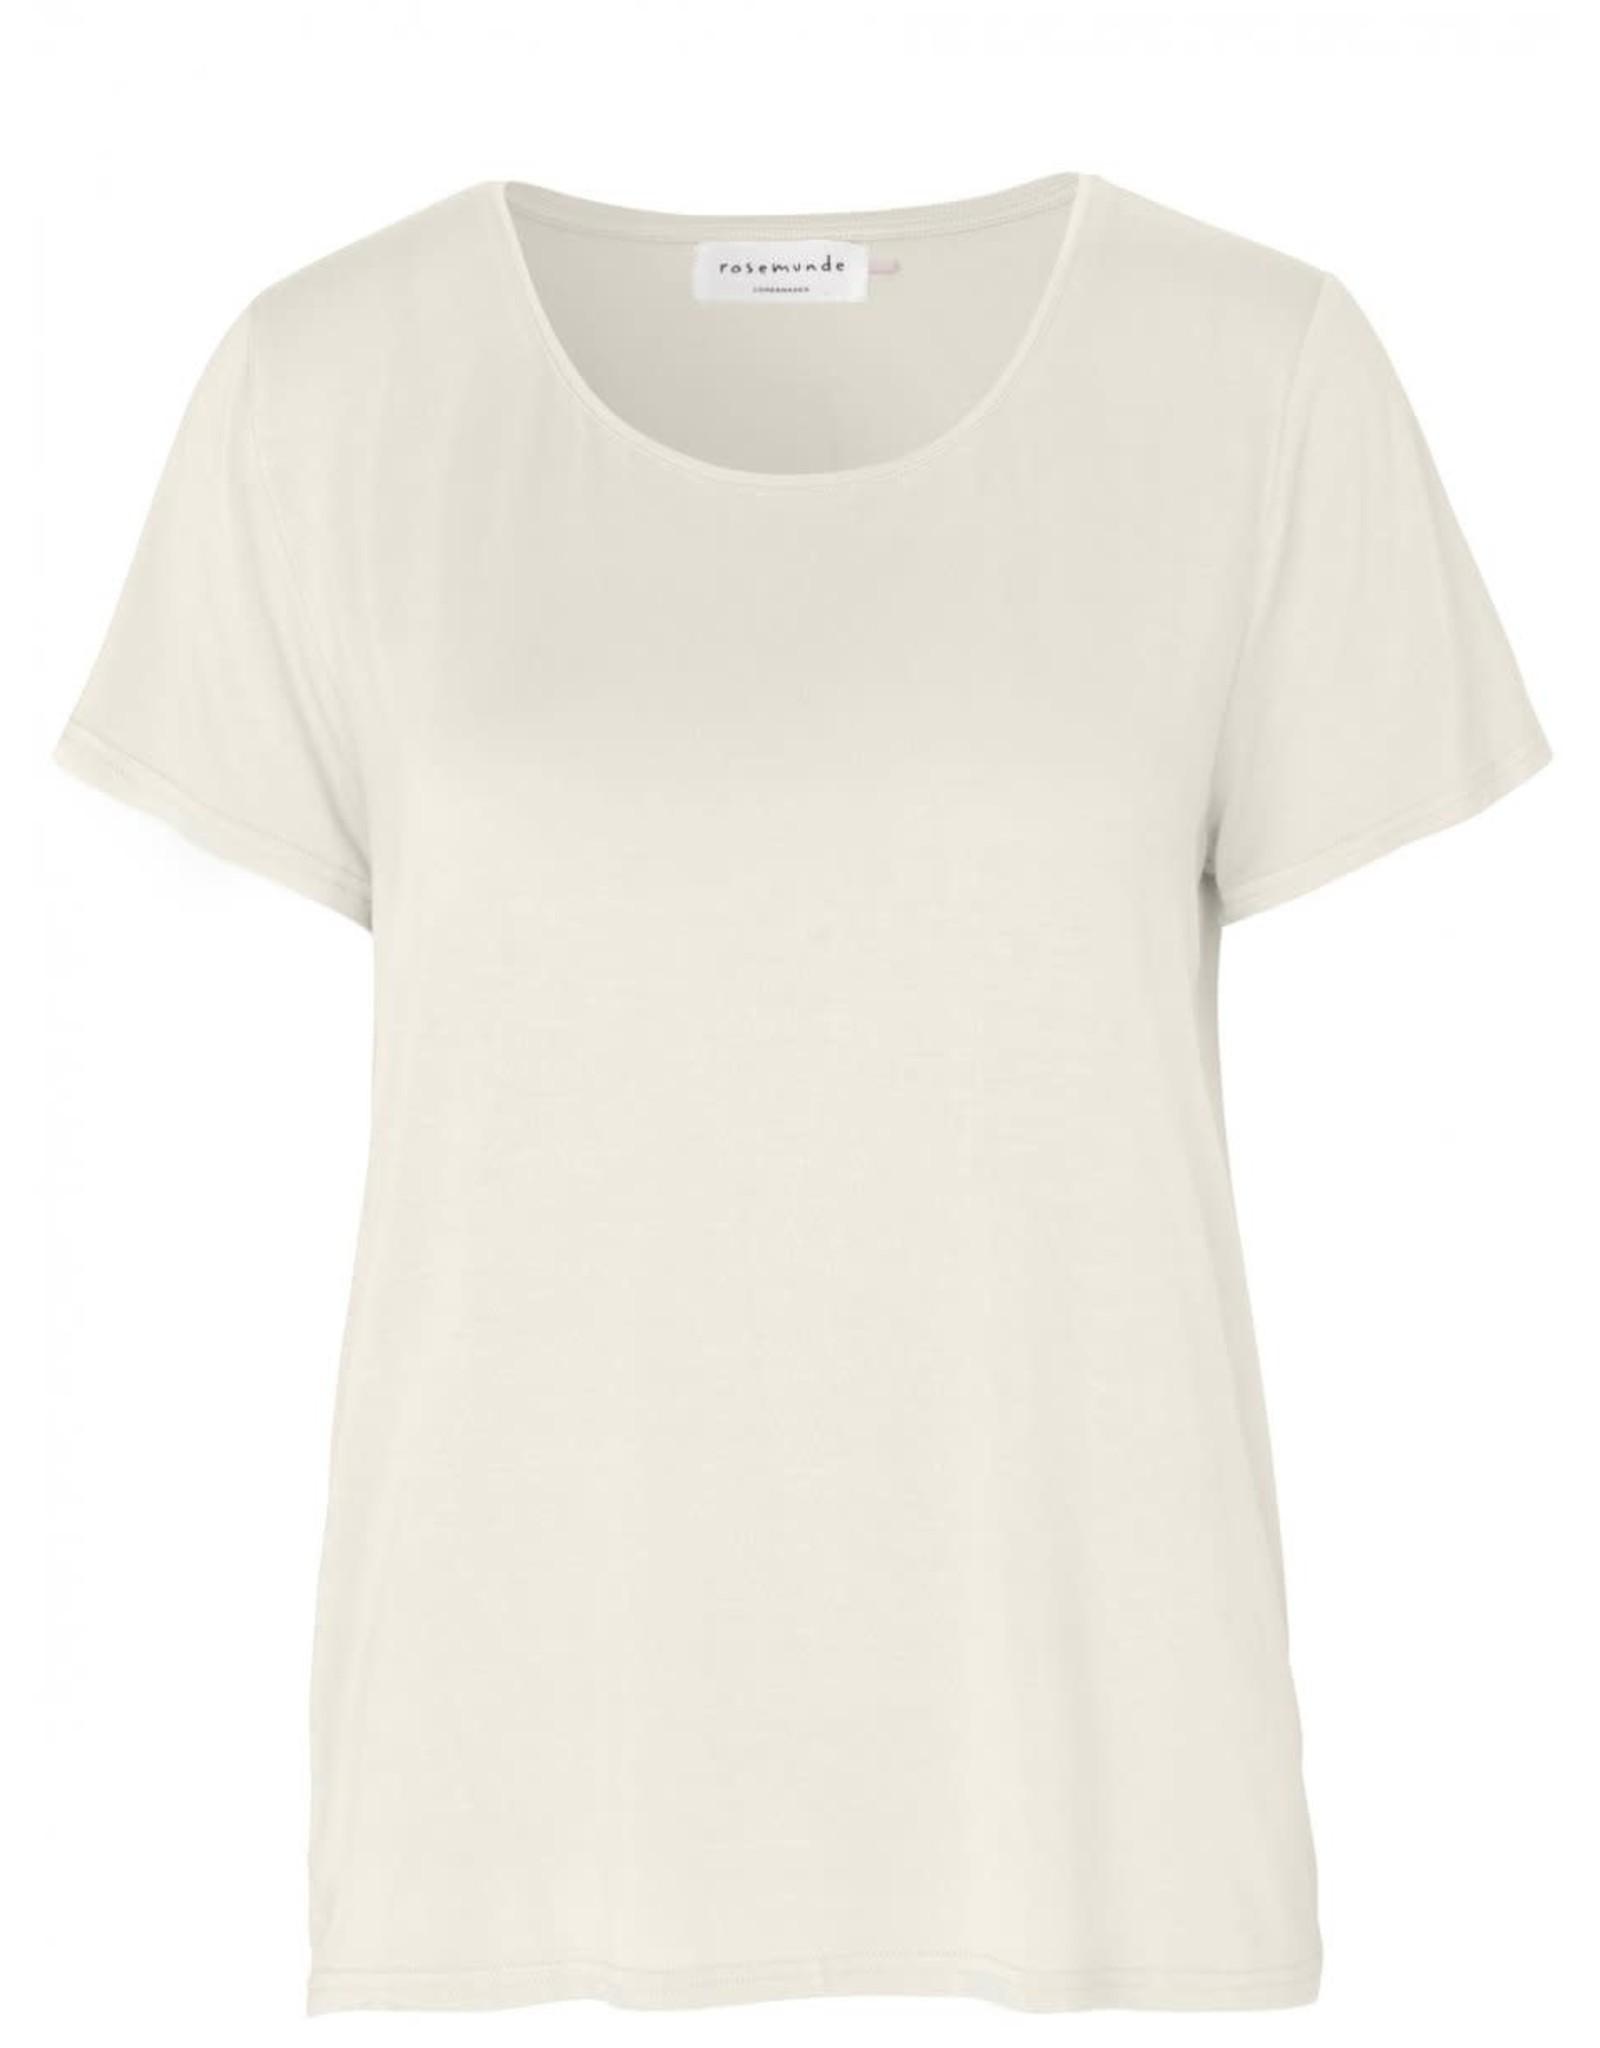 Rosemunde T-Shirt  viscose - Ivory